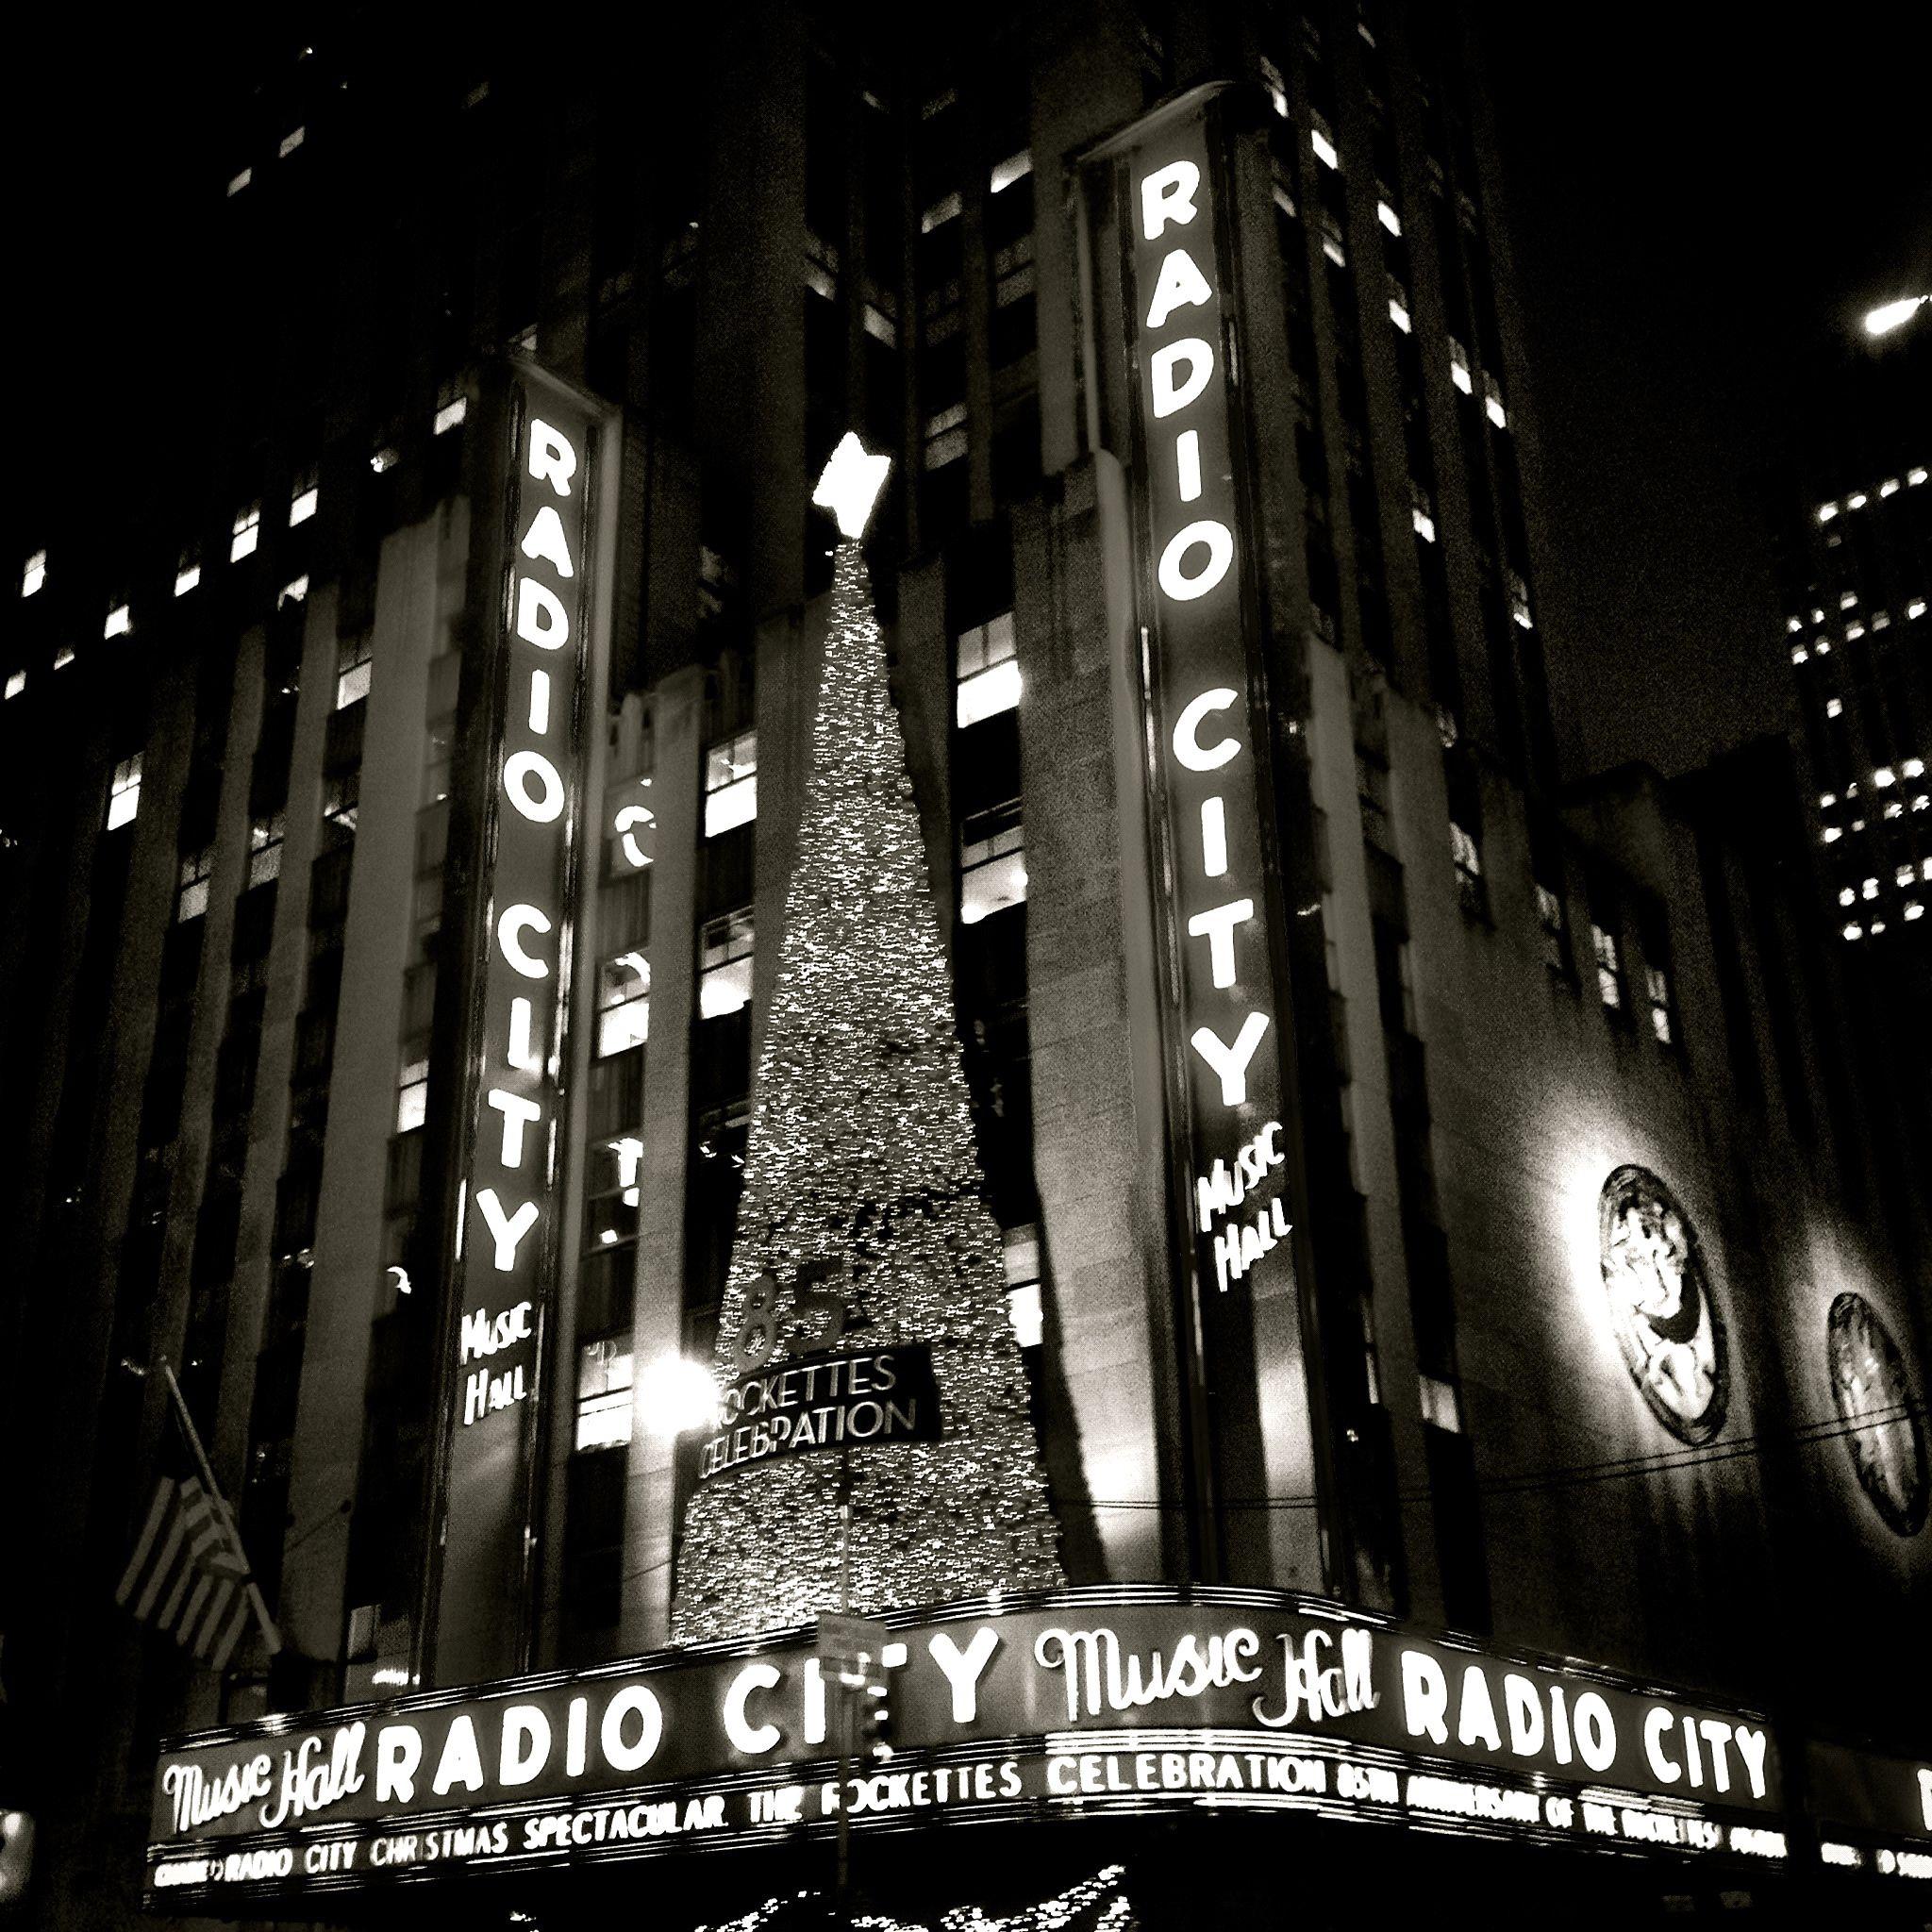 Radio City Music Hall B&W - Christmas in 2018 | Vintage New York all ...